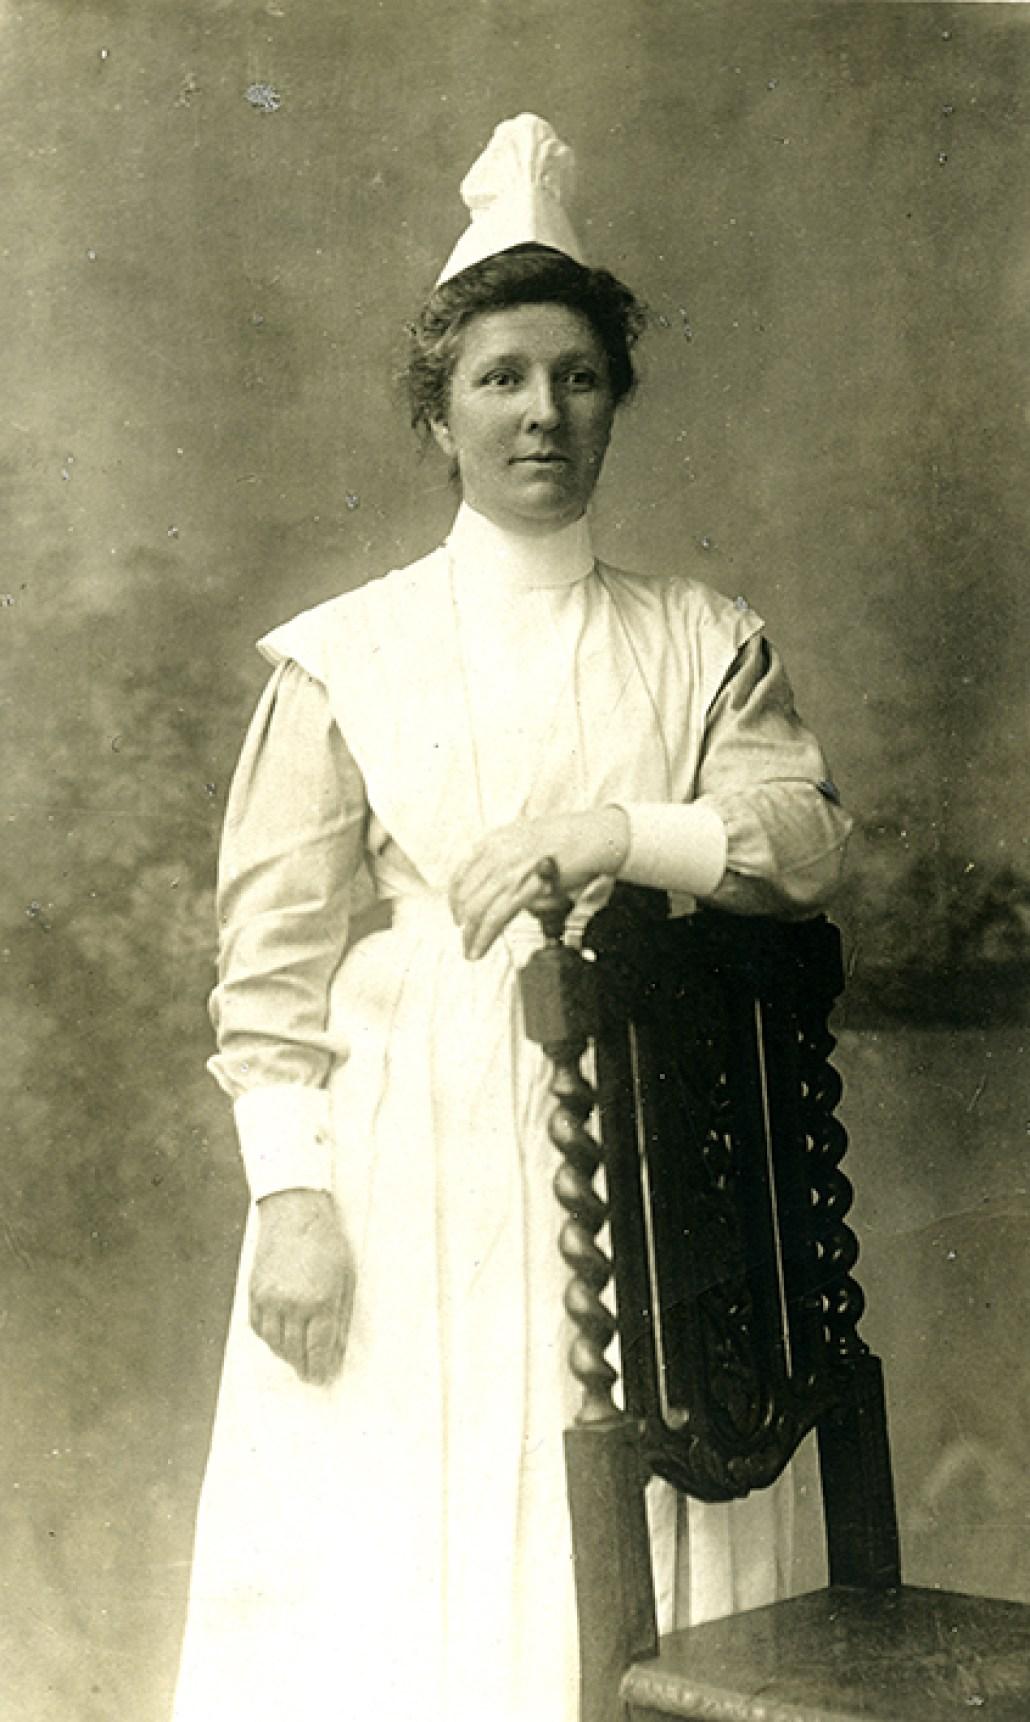 Nurse at Boyle St. Hospital - later Mrs. Briuker, Millet, c.1906. Photo courtesy of the City of Edmonton Archives EA-10-1595.